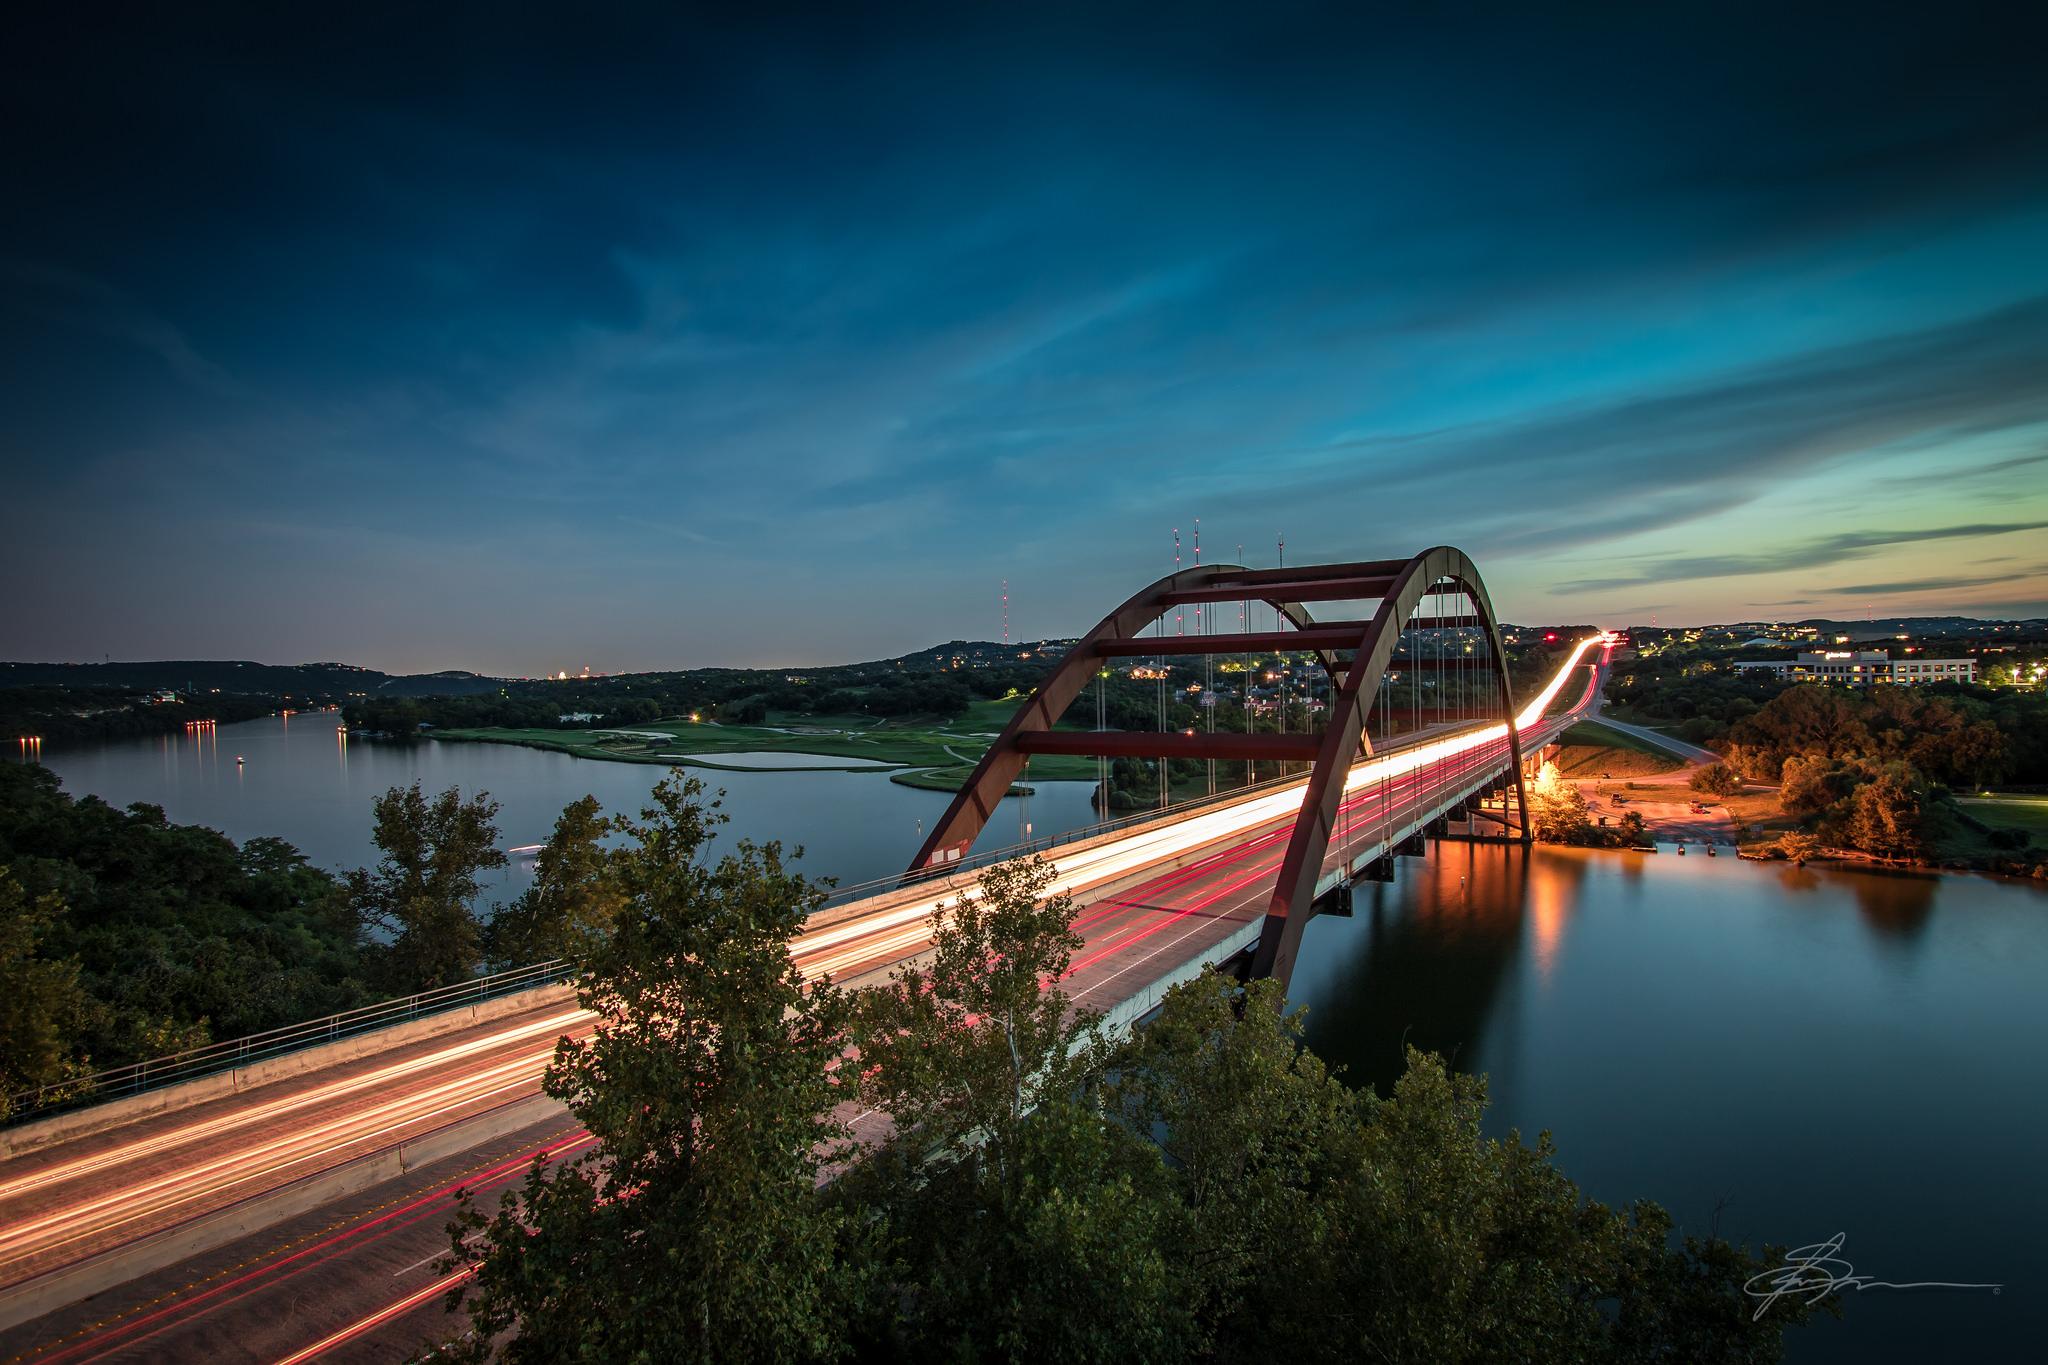 Austin-Texas-Bridge-by-Red-Photography-www-RedPhoto-com-wallpaper-wpc5802372